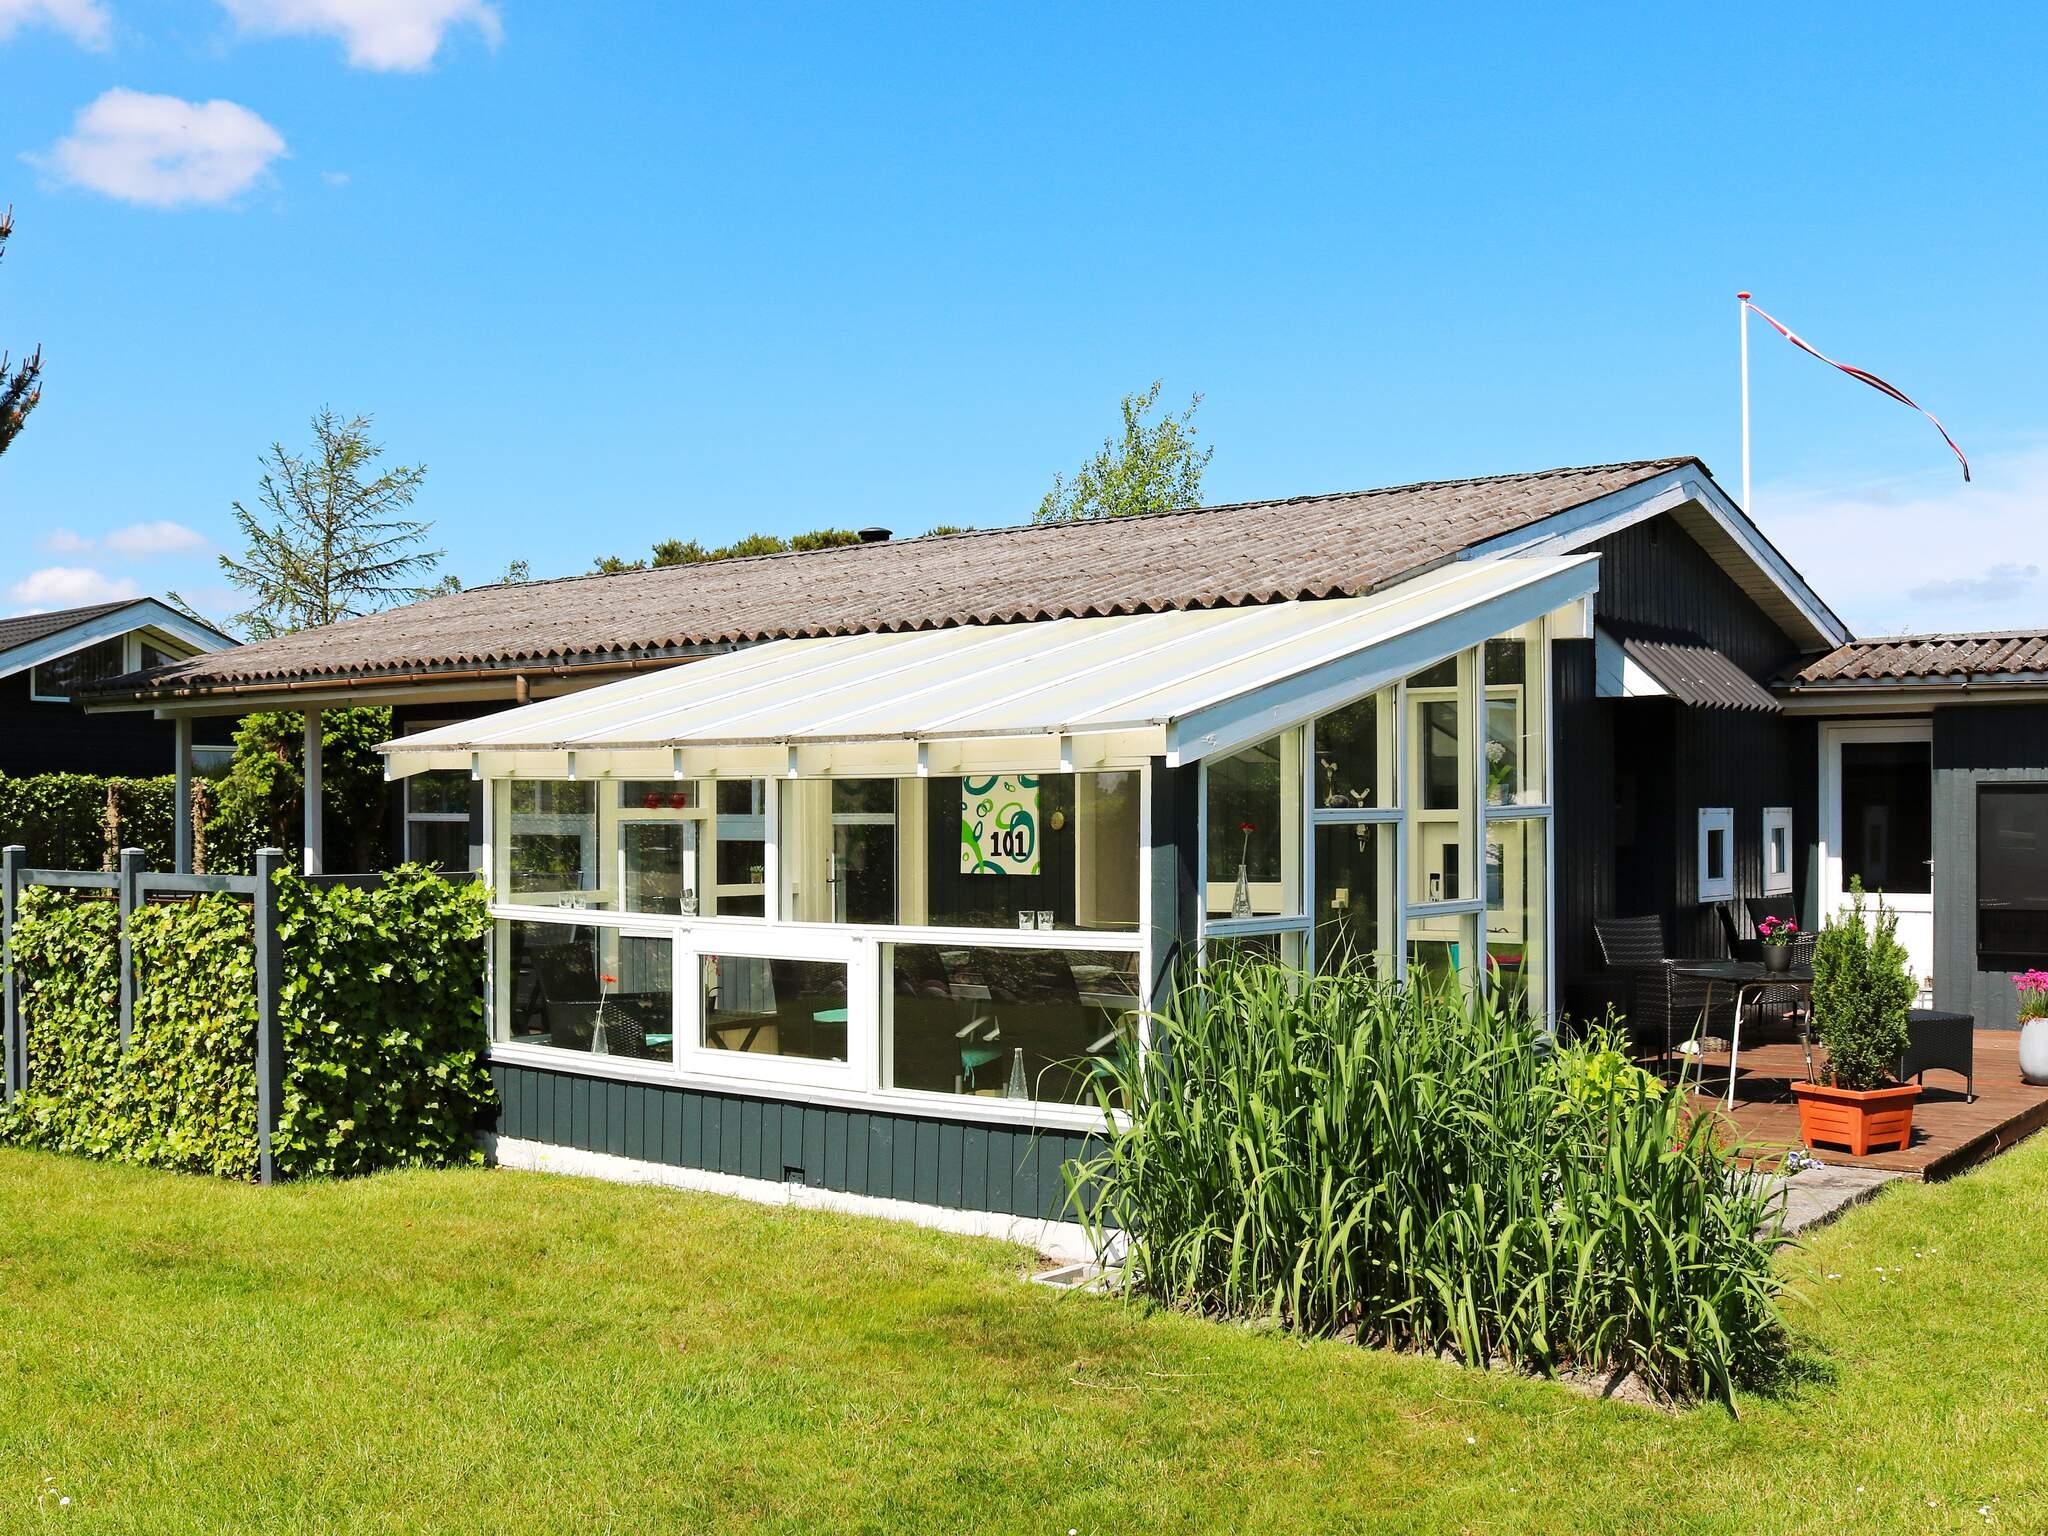 Ferienhaus Øster Hurup (356533), Øster Hurup, , Dänische Ostsee, Dänemark, Bild 13